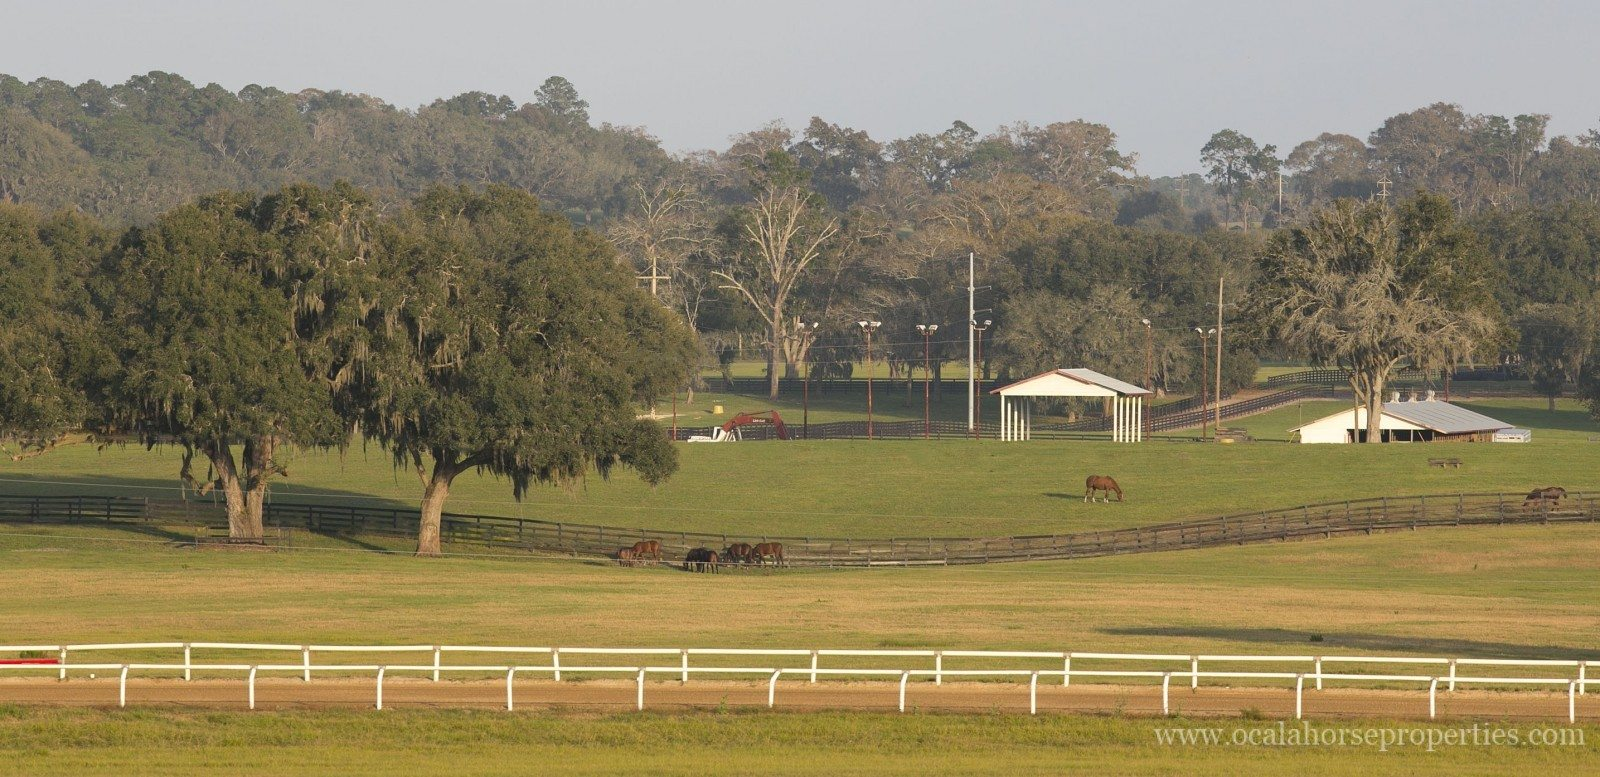 Bridlewood Ocala Horse Farm For Sale Ocala Horse